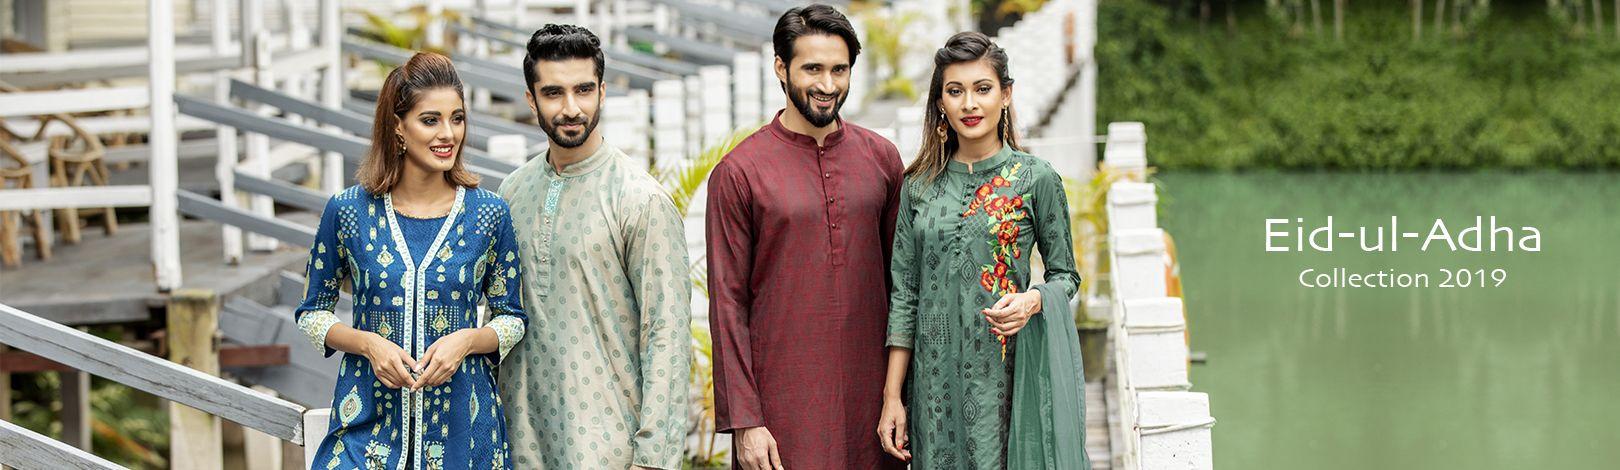 Le Reve – Leading Fashion & Lifestyle Brand in Bangladesh   A REVE